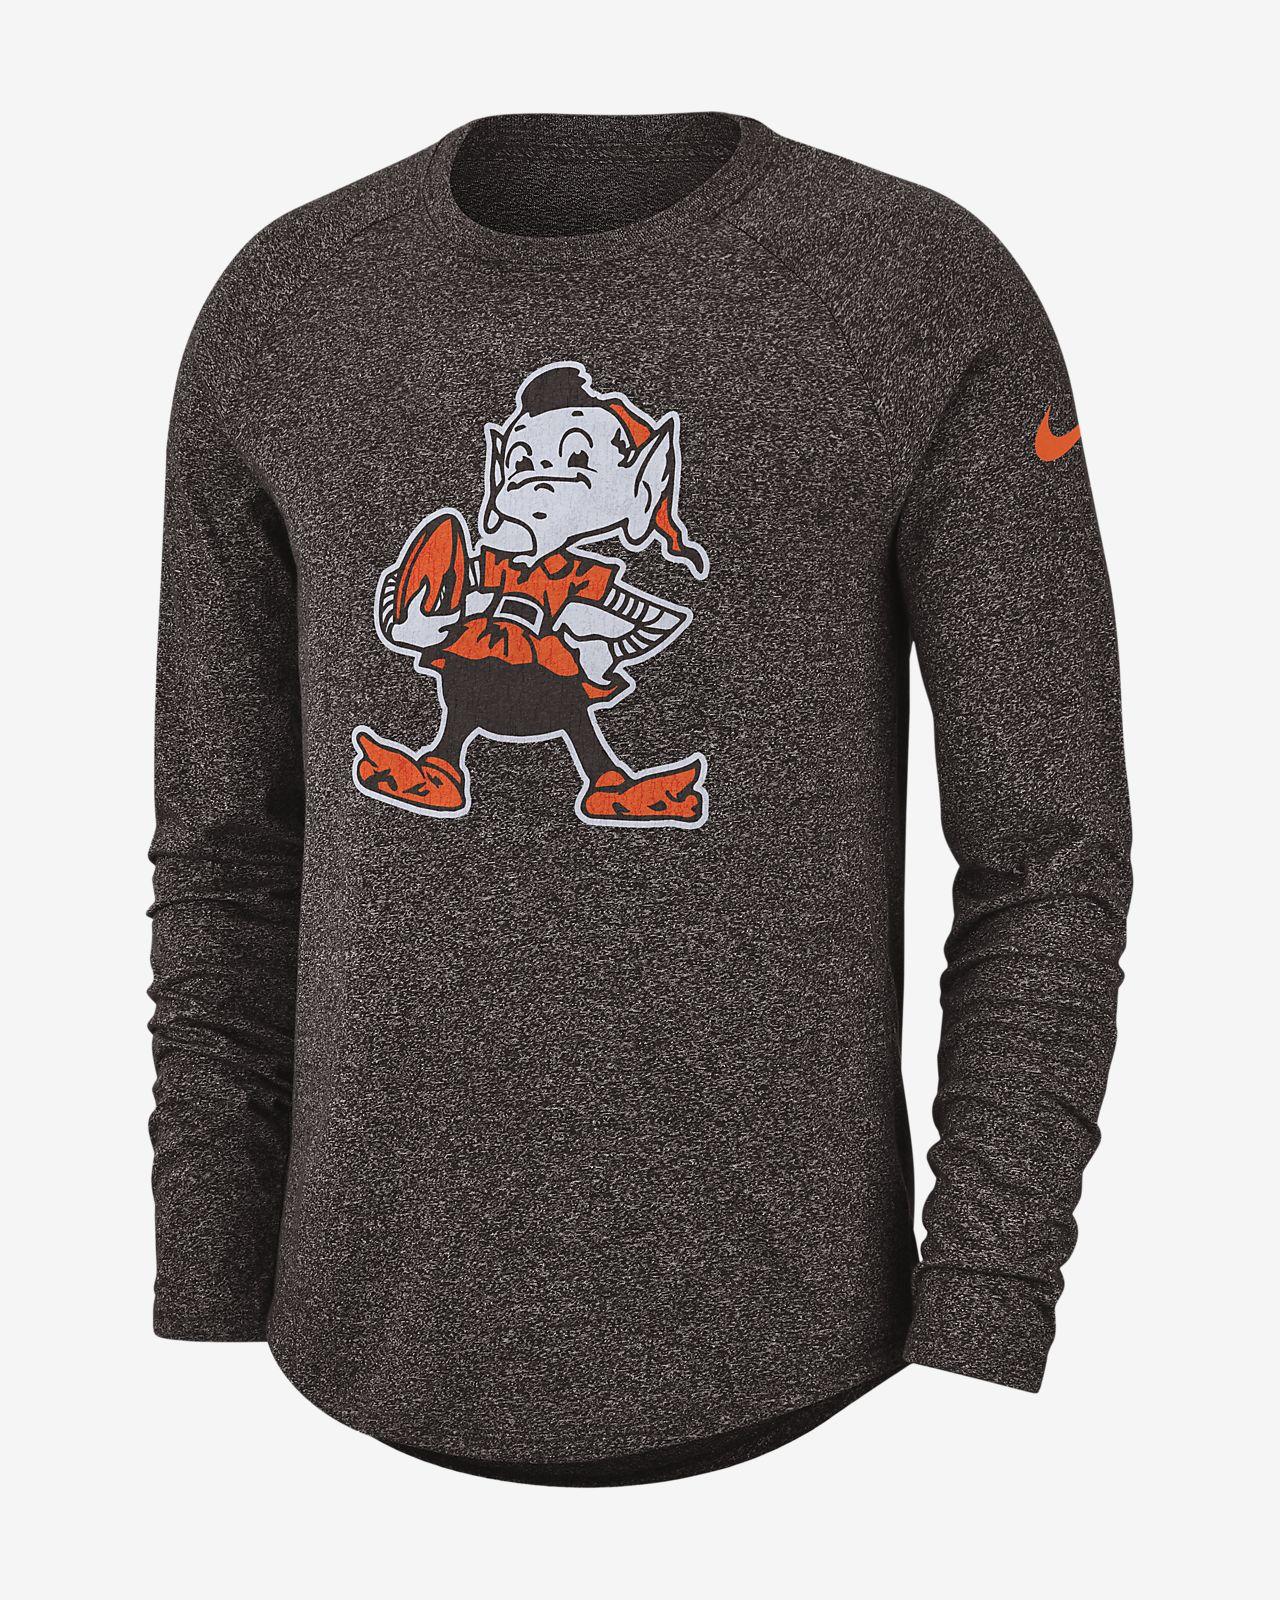 d83cccf4be6 Nike Historic (NFL Browns) Men's Long-Sleeve T-Shirt